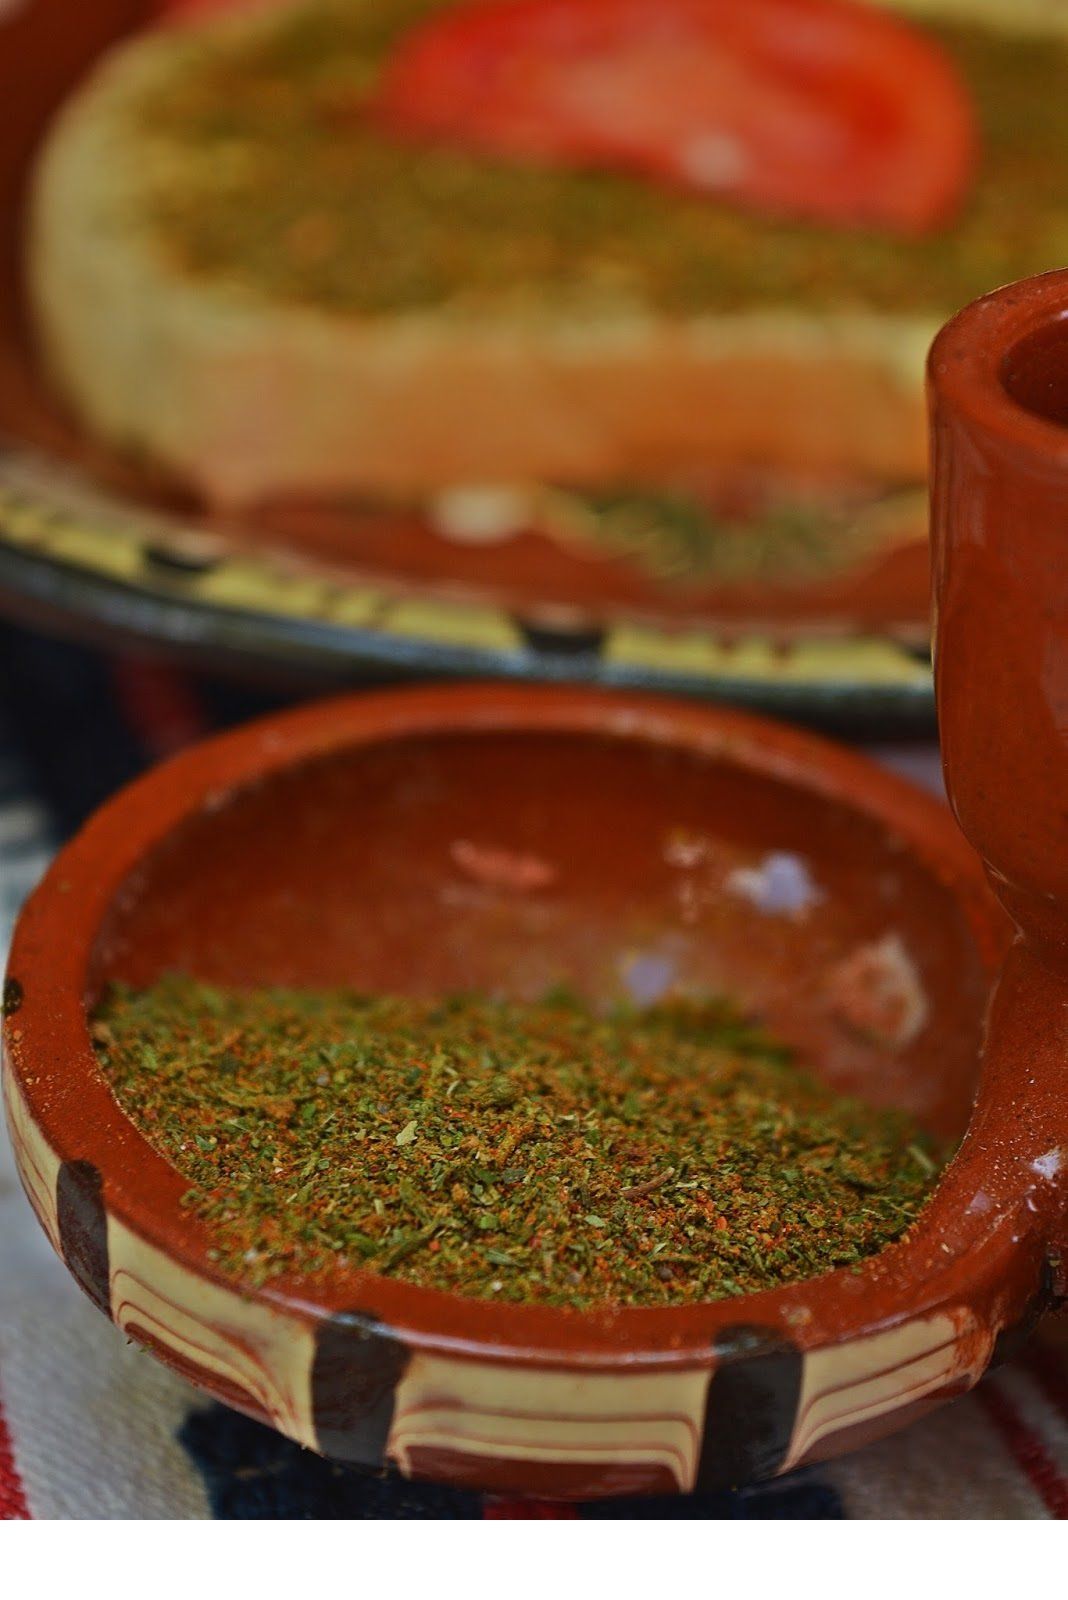 Table Salt Savory Mix - Pirin Style (Spicy)